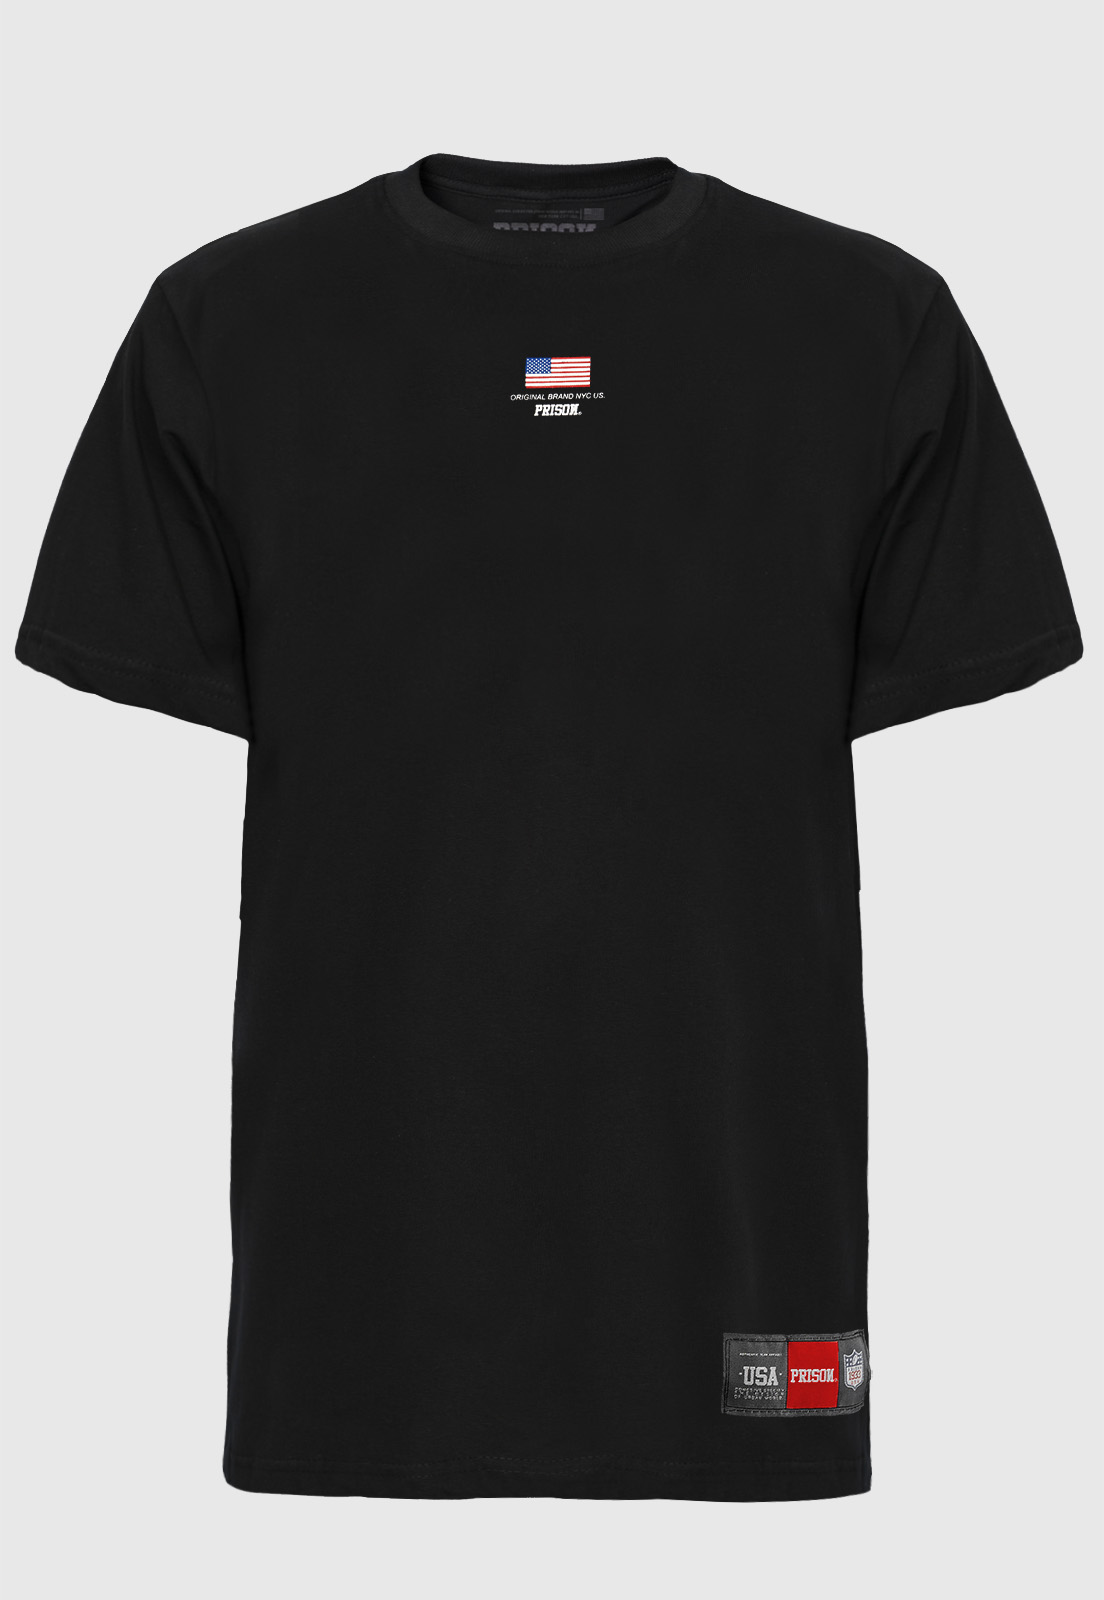 Camiseta  Streetwear Prison Brand NYC